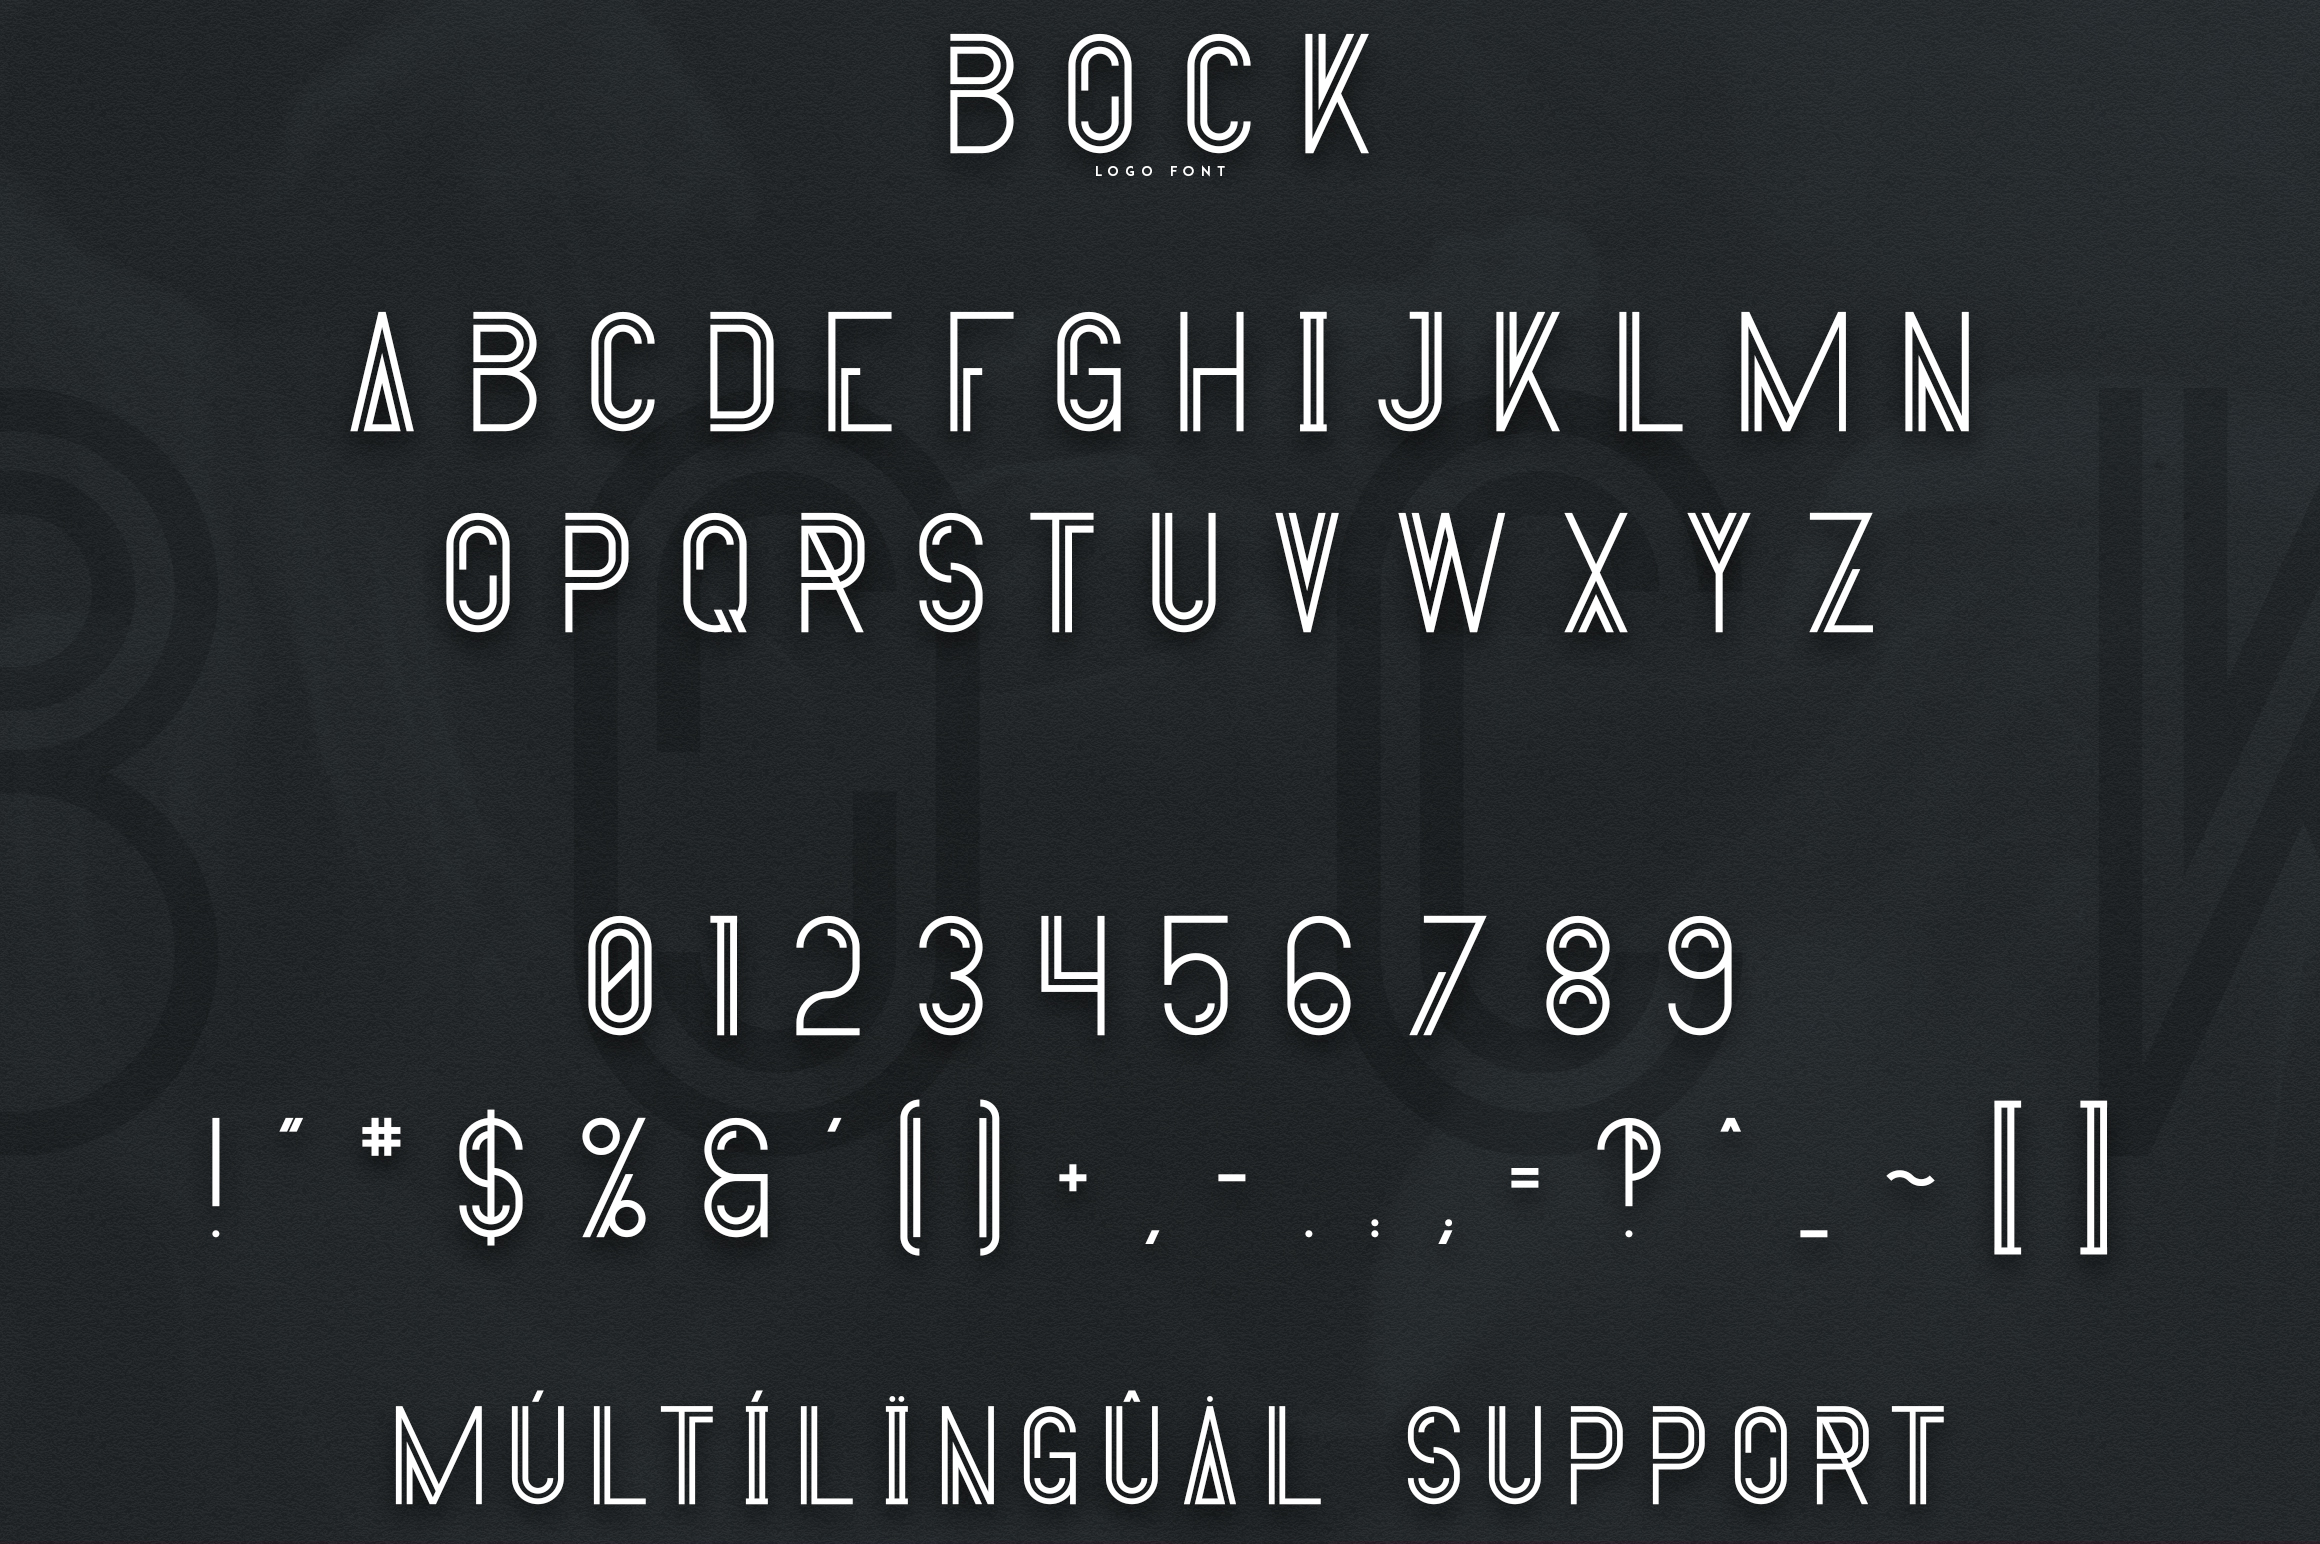 Bock - Logo Font example image 7